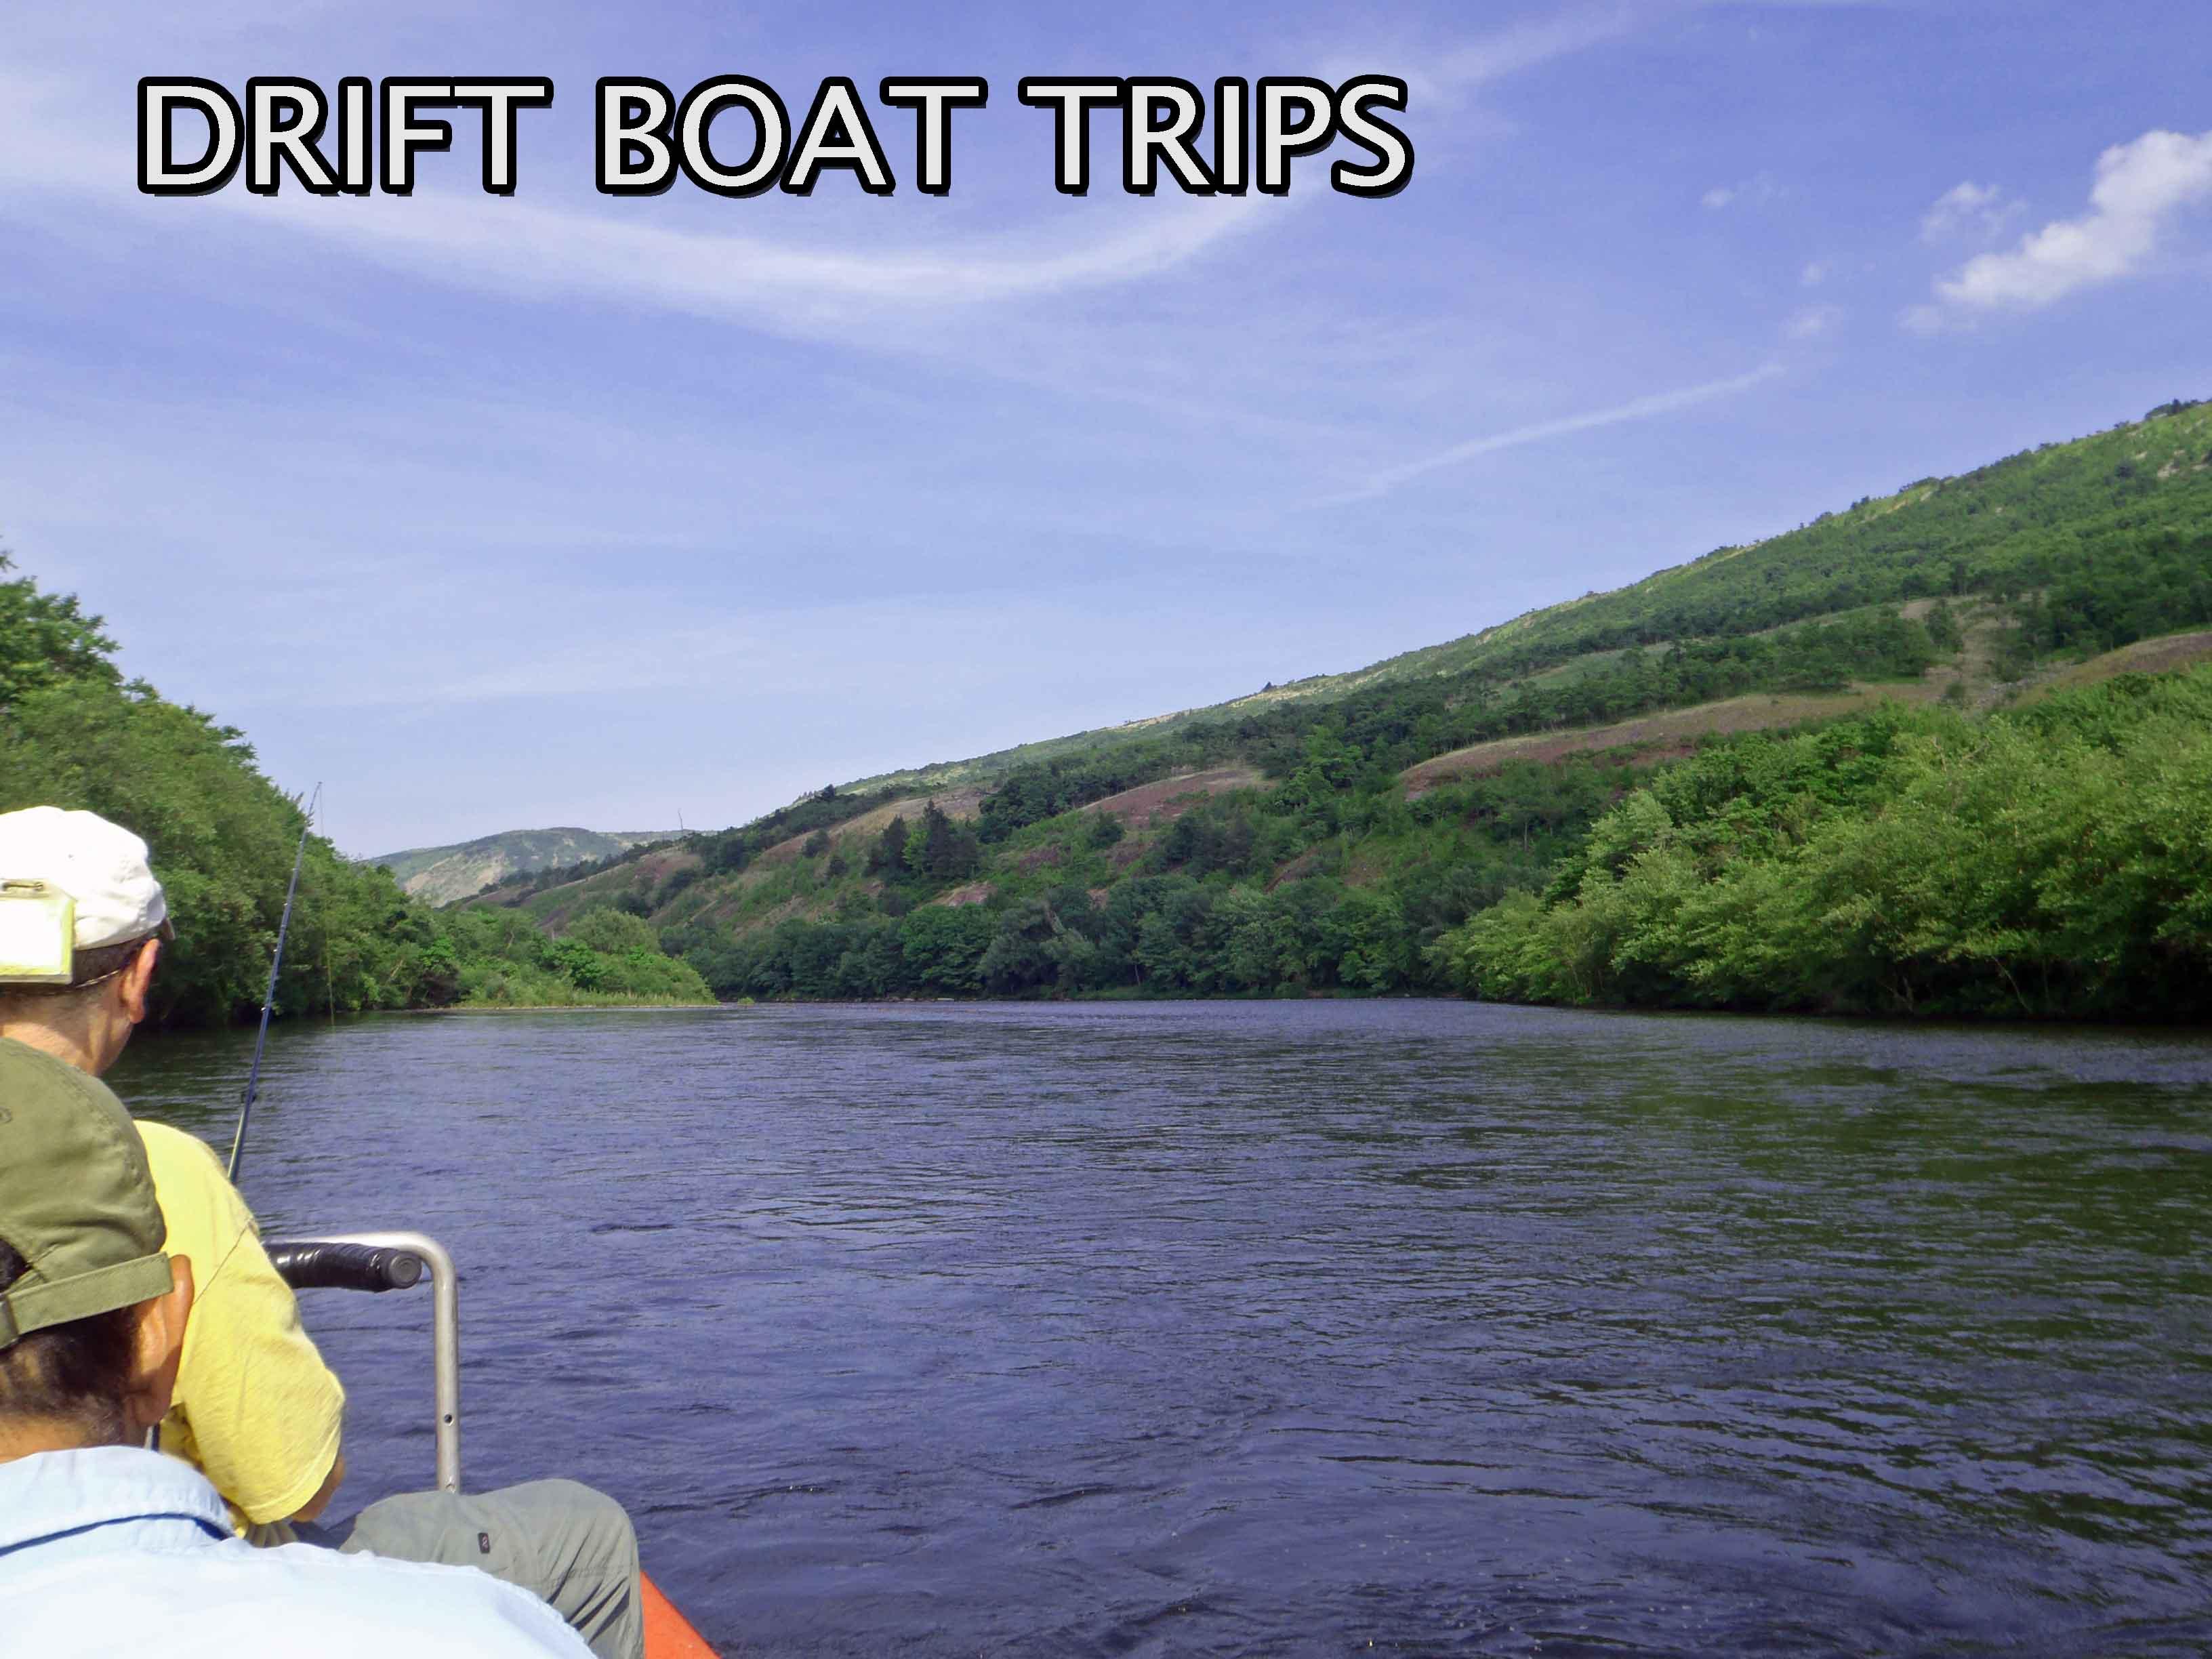 Drift Boat Trips On The Lehigh, Delaware, Susquehanna and Juniata Rivers